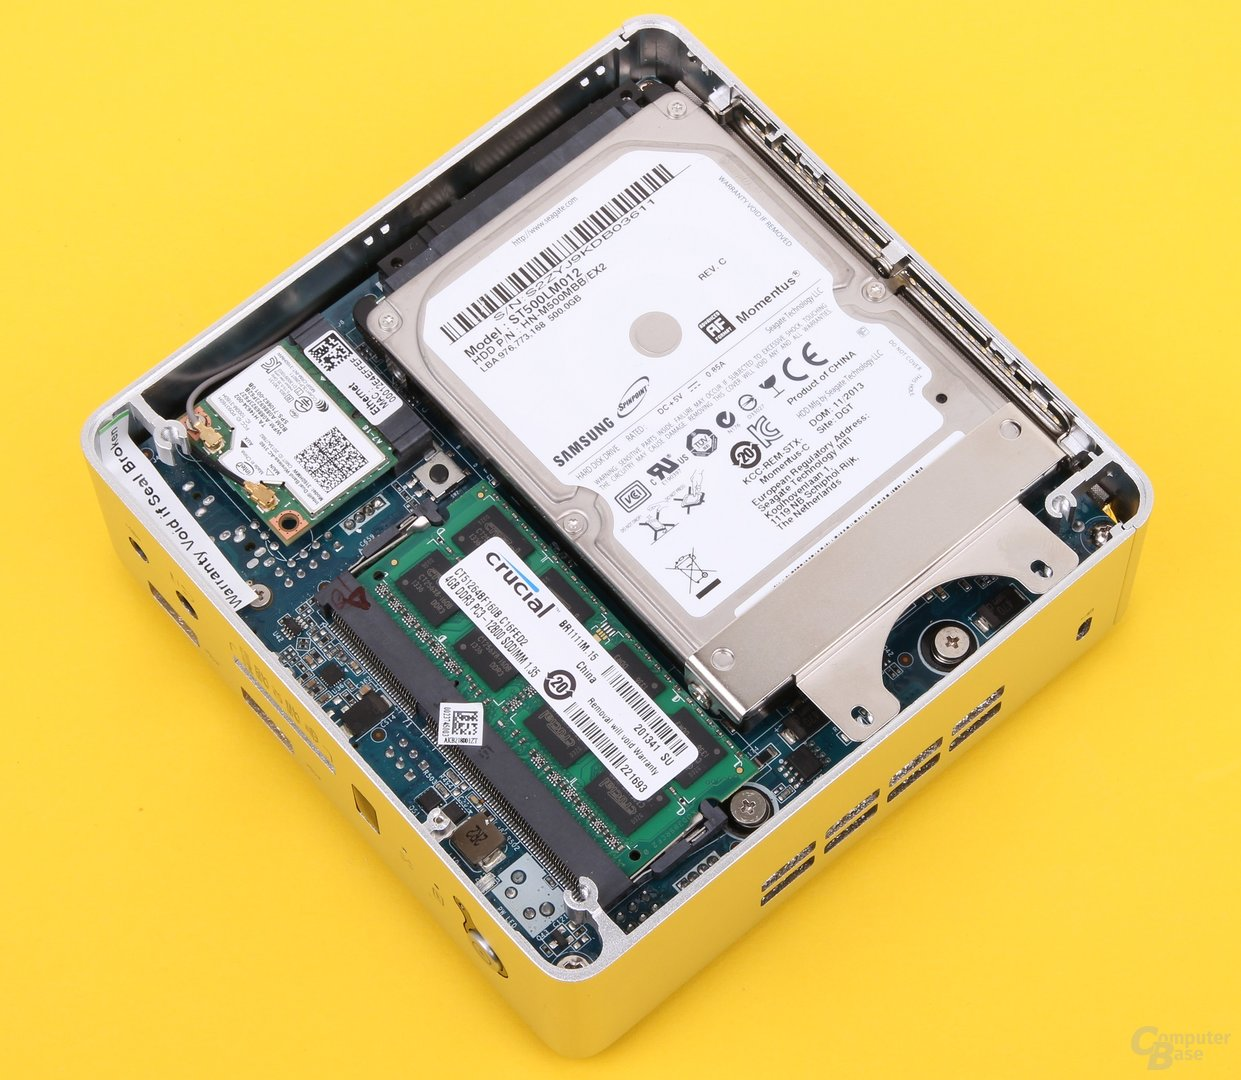 Zotac Zbox nano AQ02 Plus geöffnet